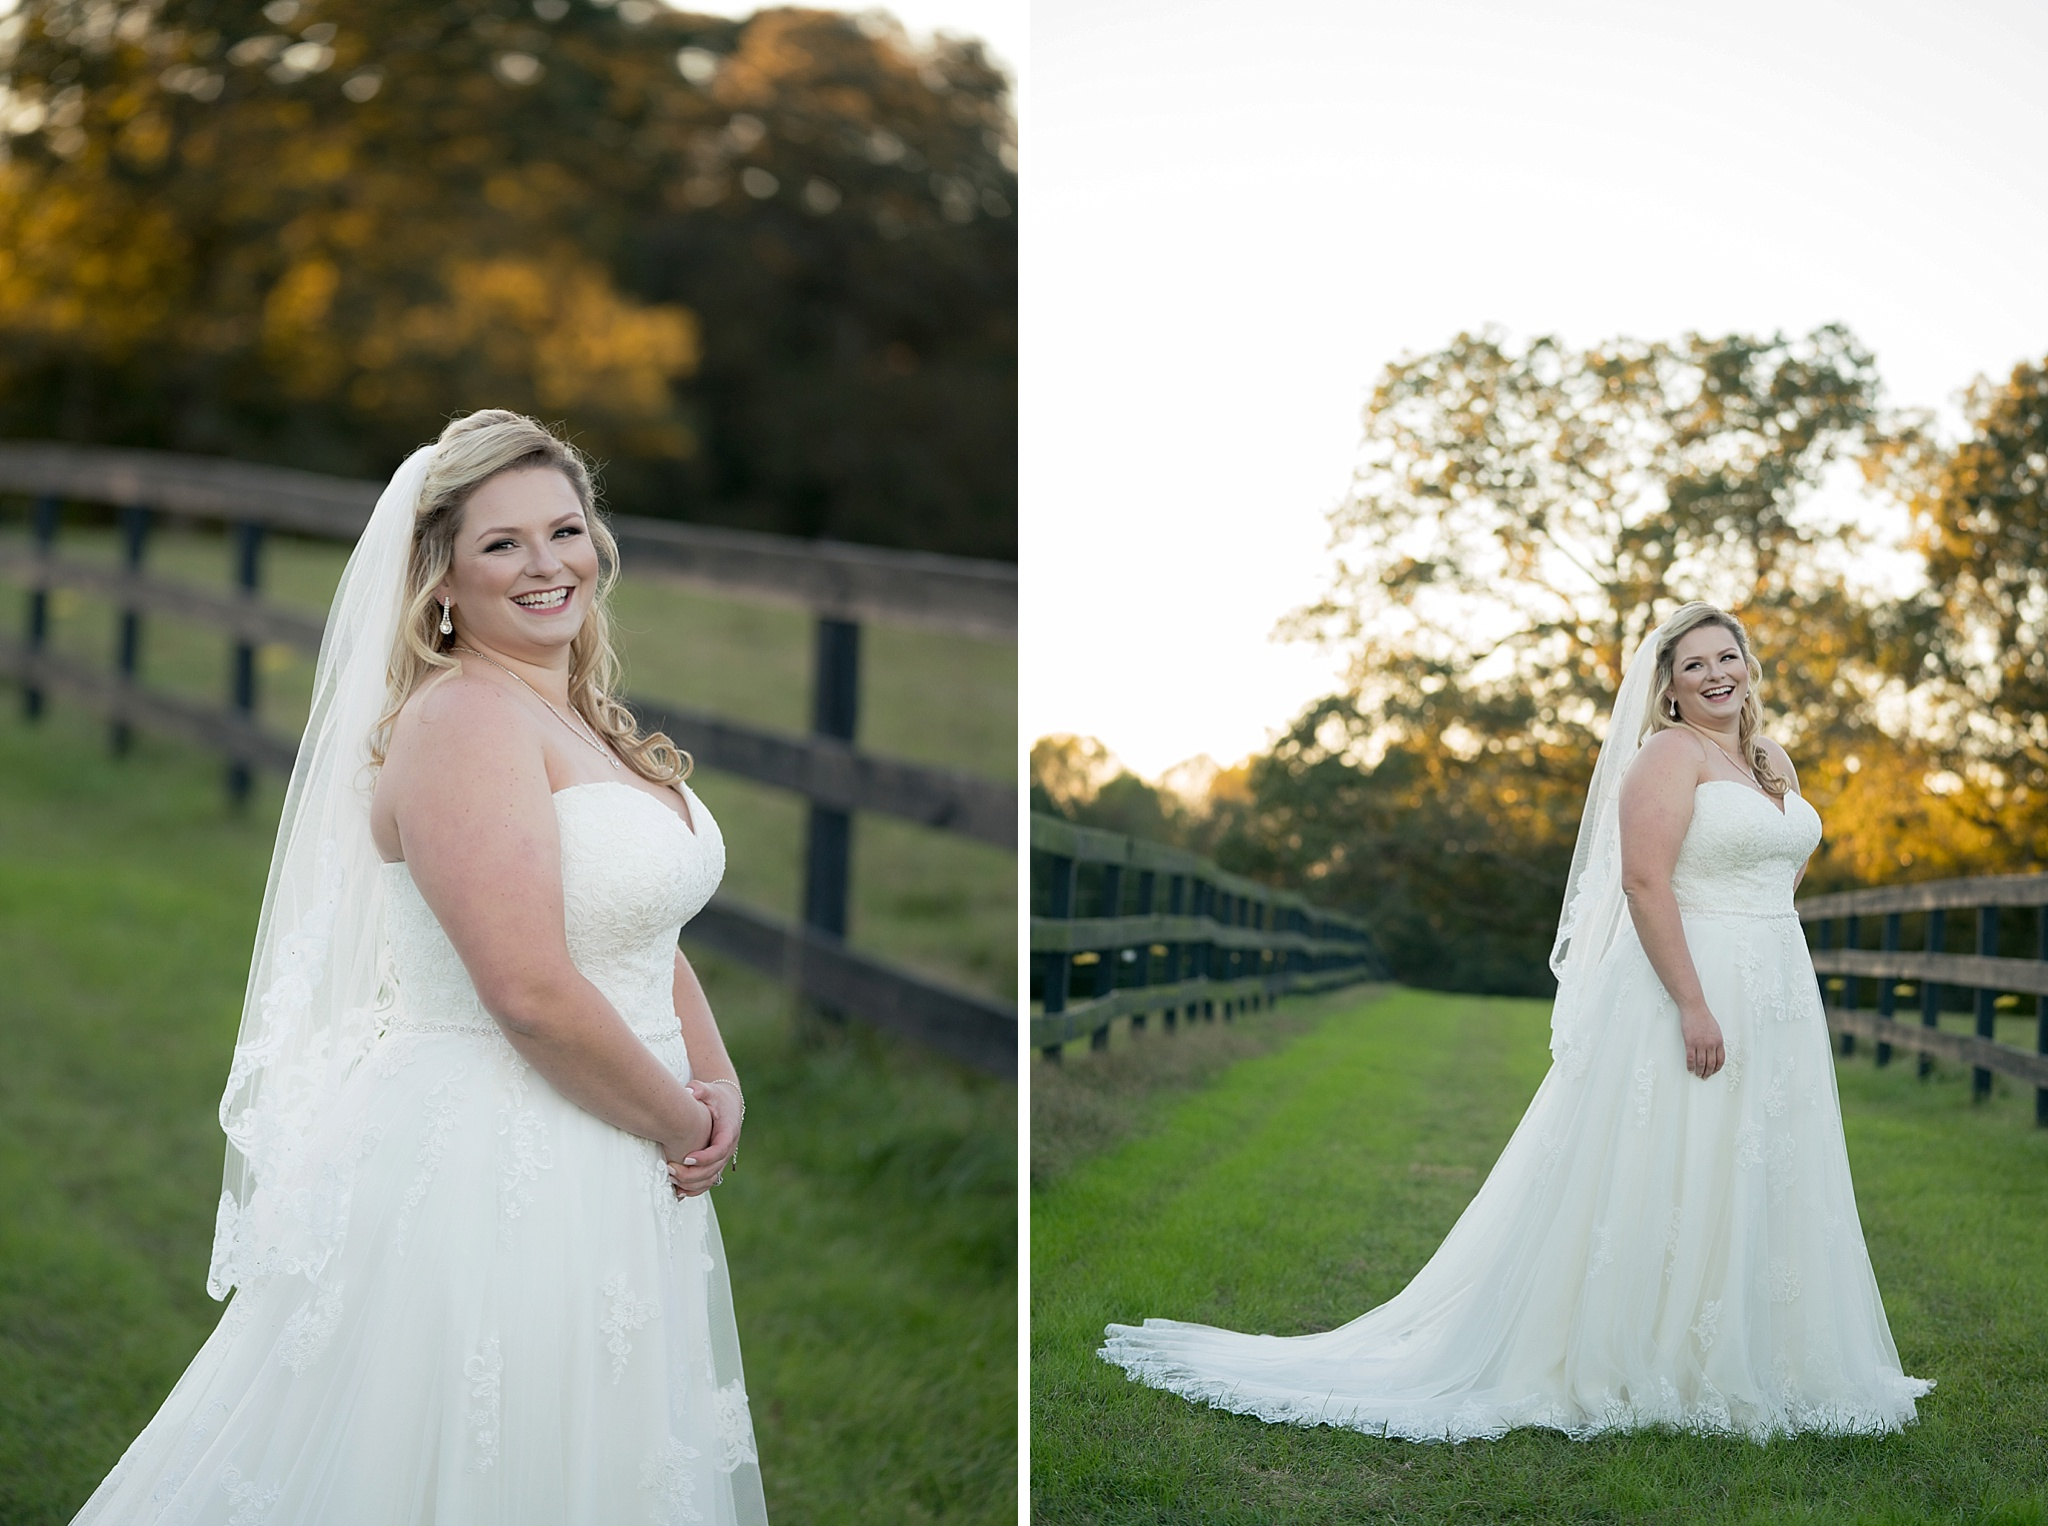 Little-Herb-House-Wedding-Photographer-067.jpg